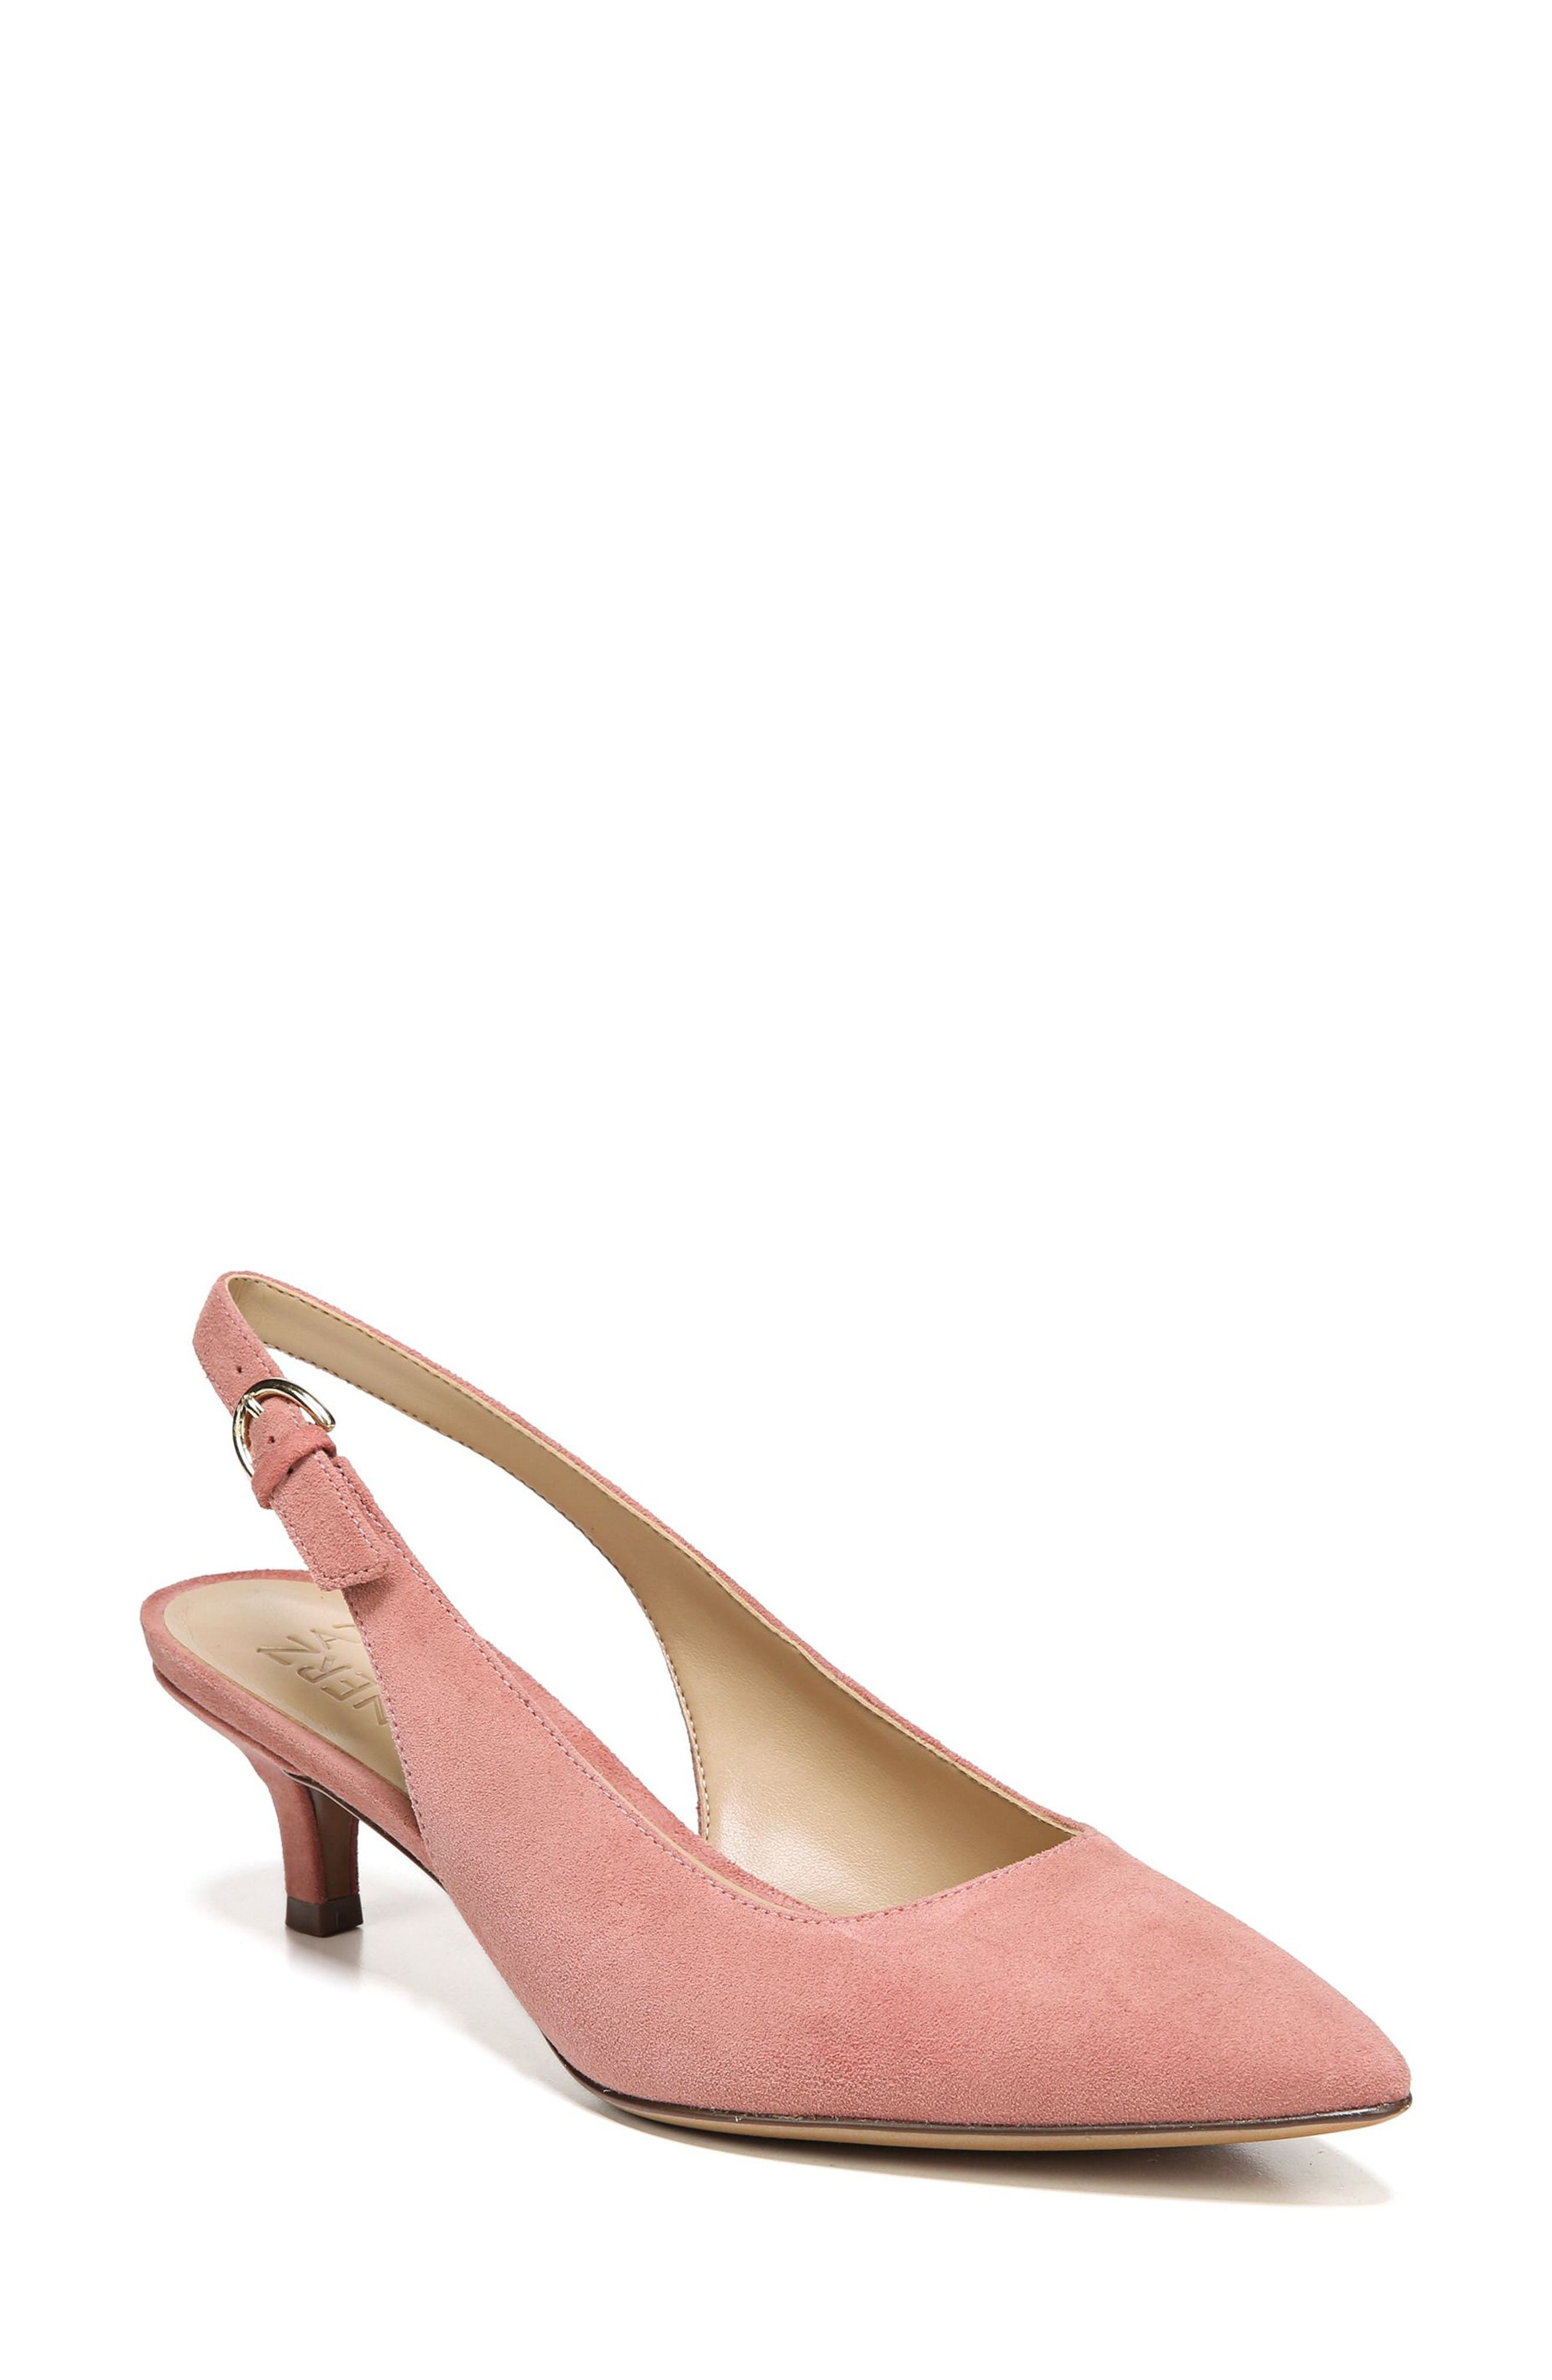 Peyton Slingback Pump,                             Main thumbnail 1, color,                             Pink Leather